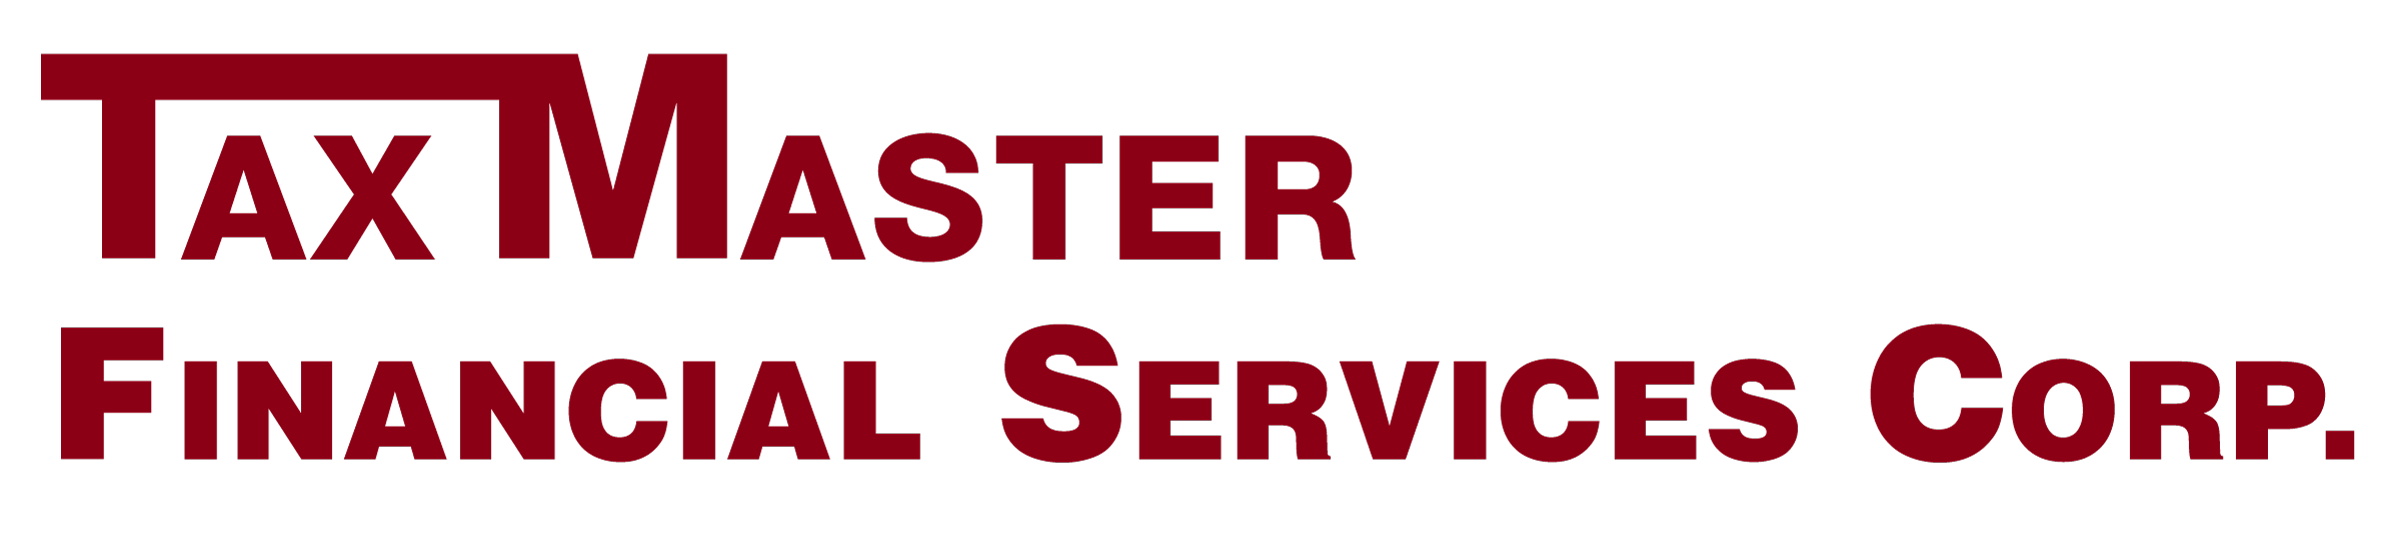 Taxmaster Financial Services